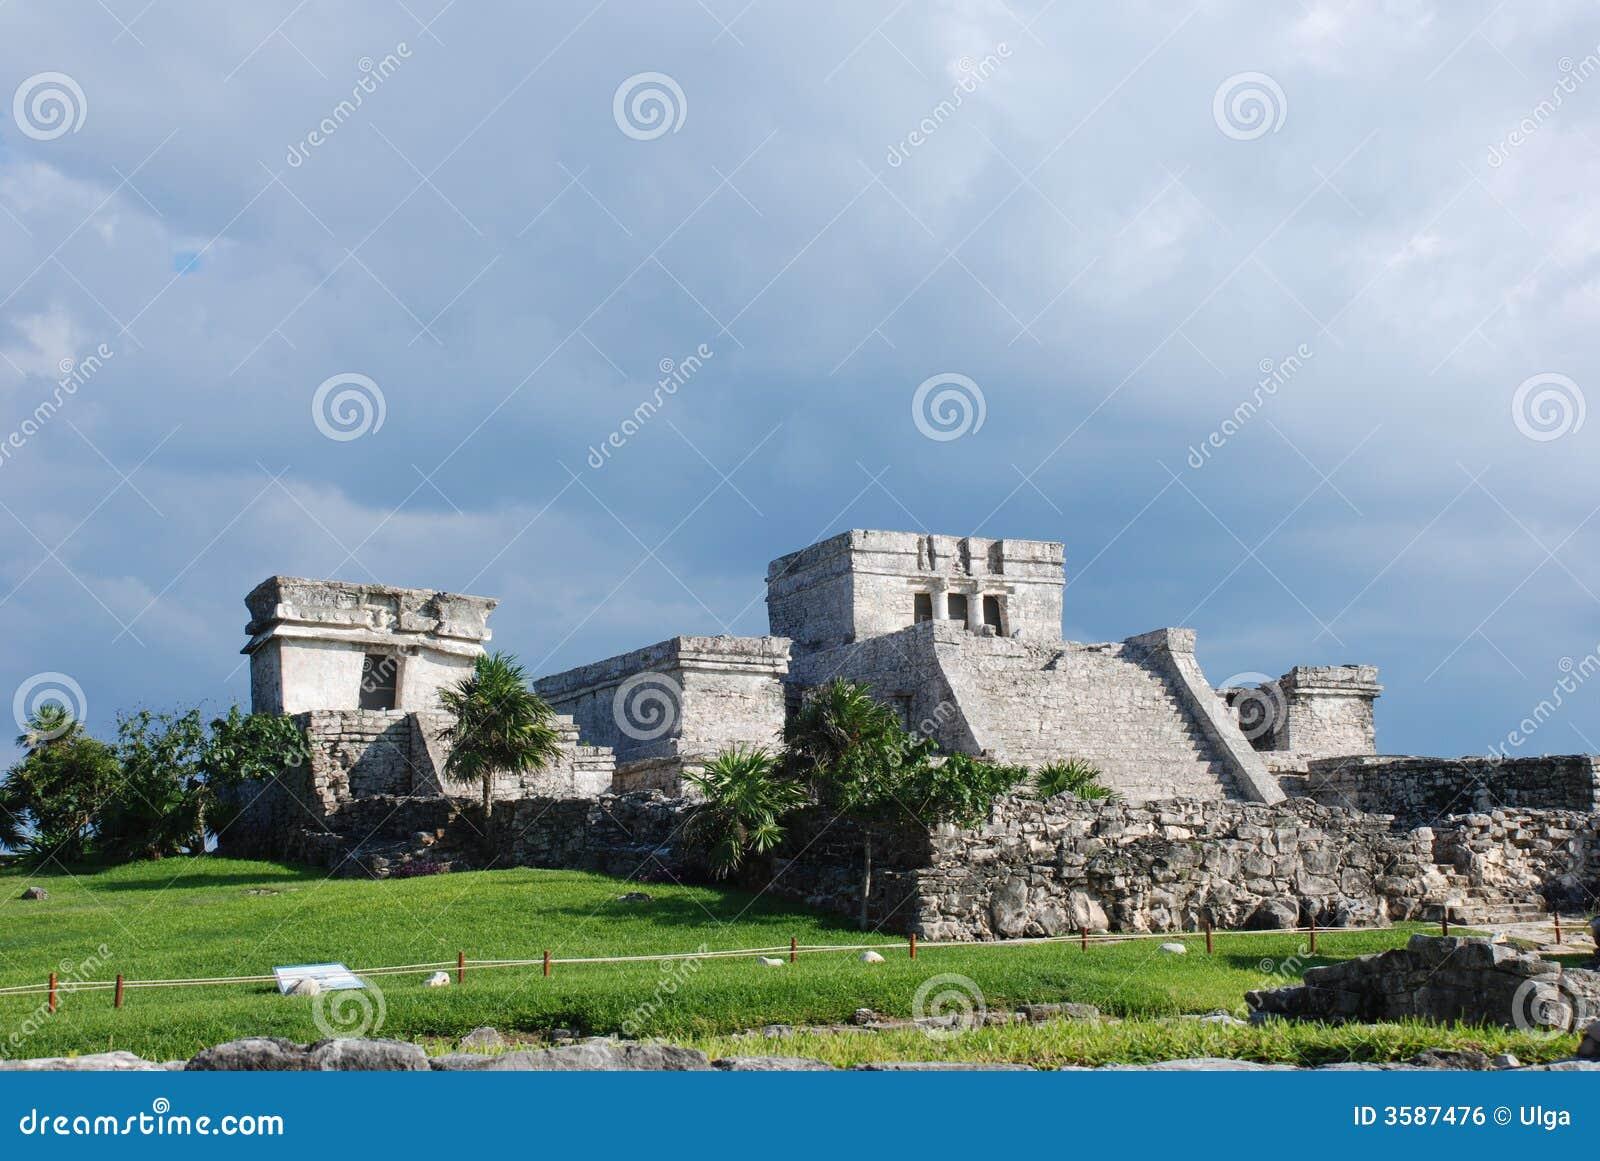 De ruïnes van Tulum in Mexico